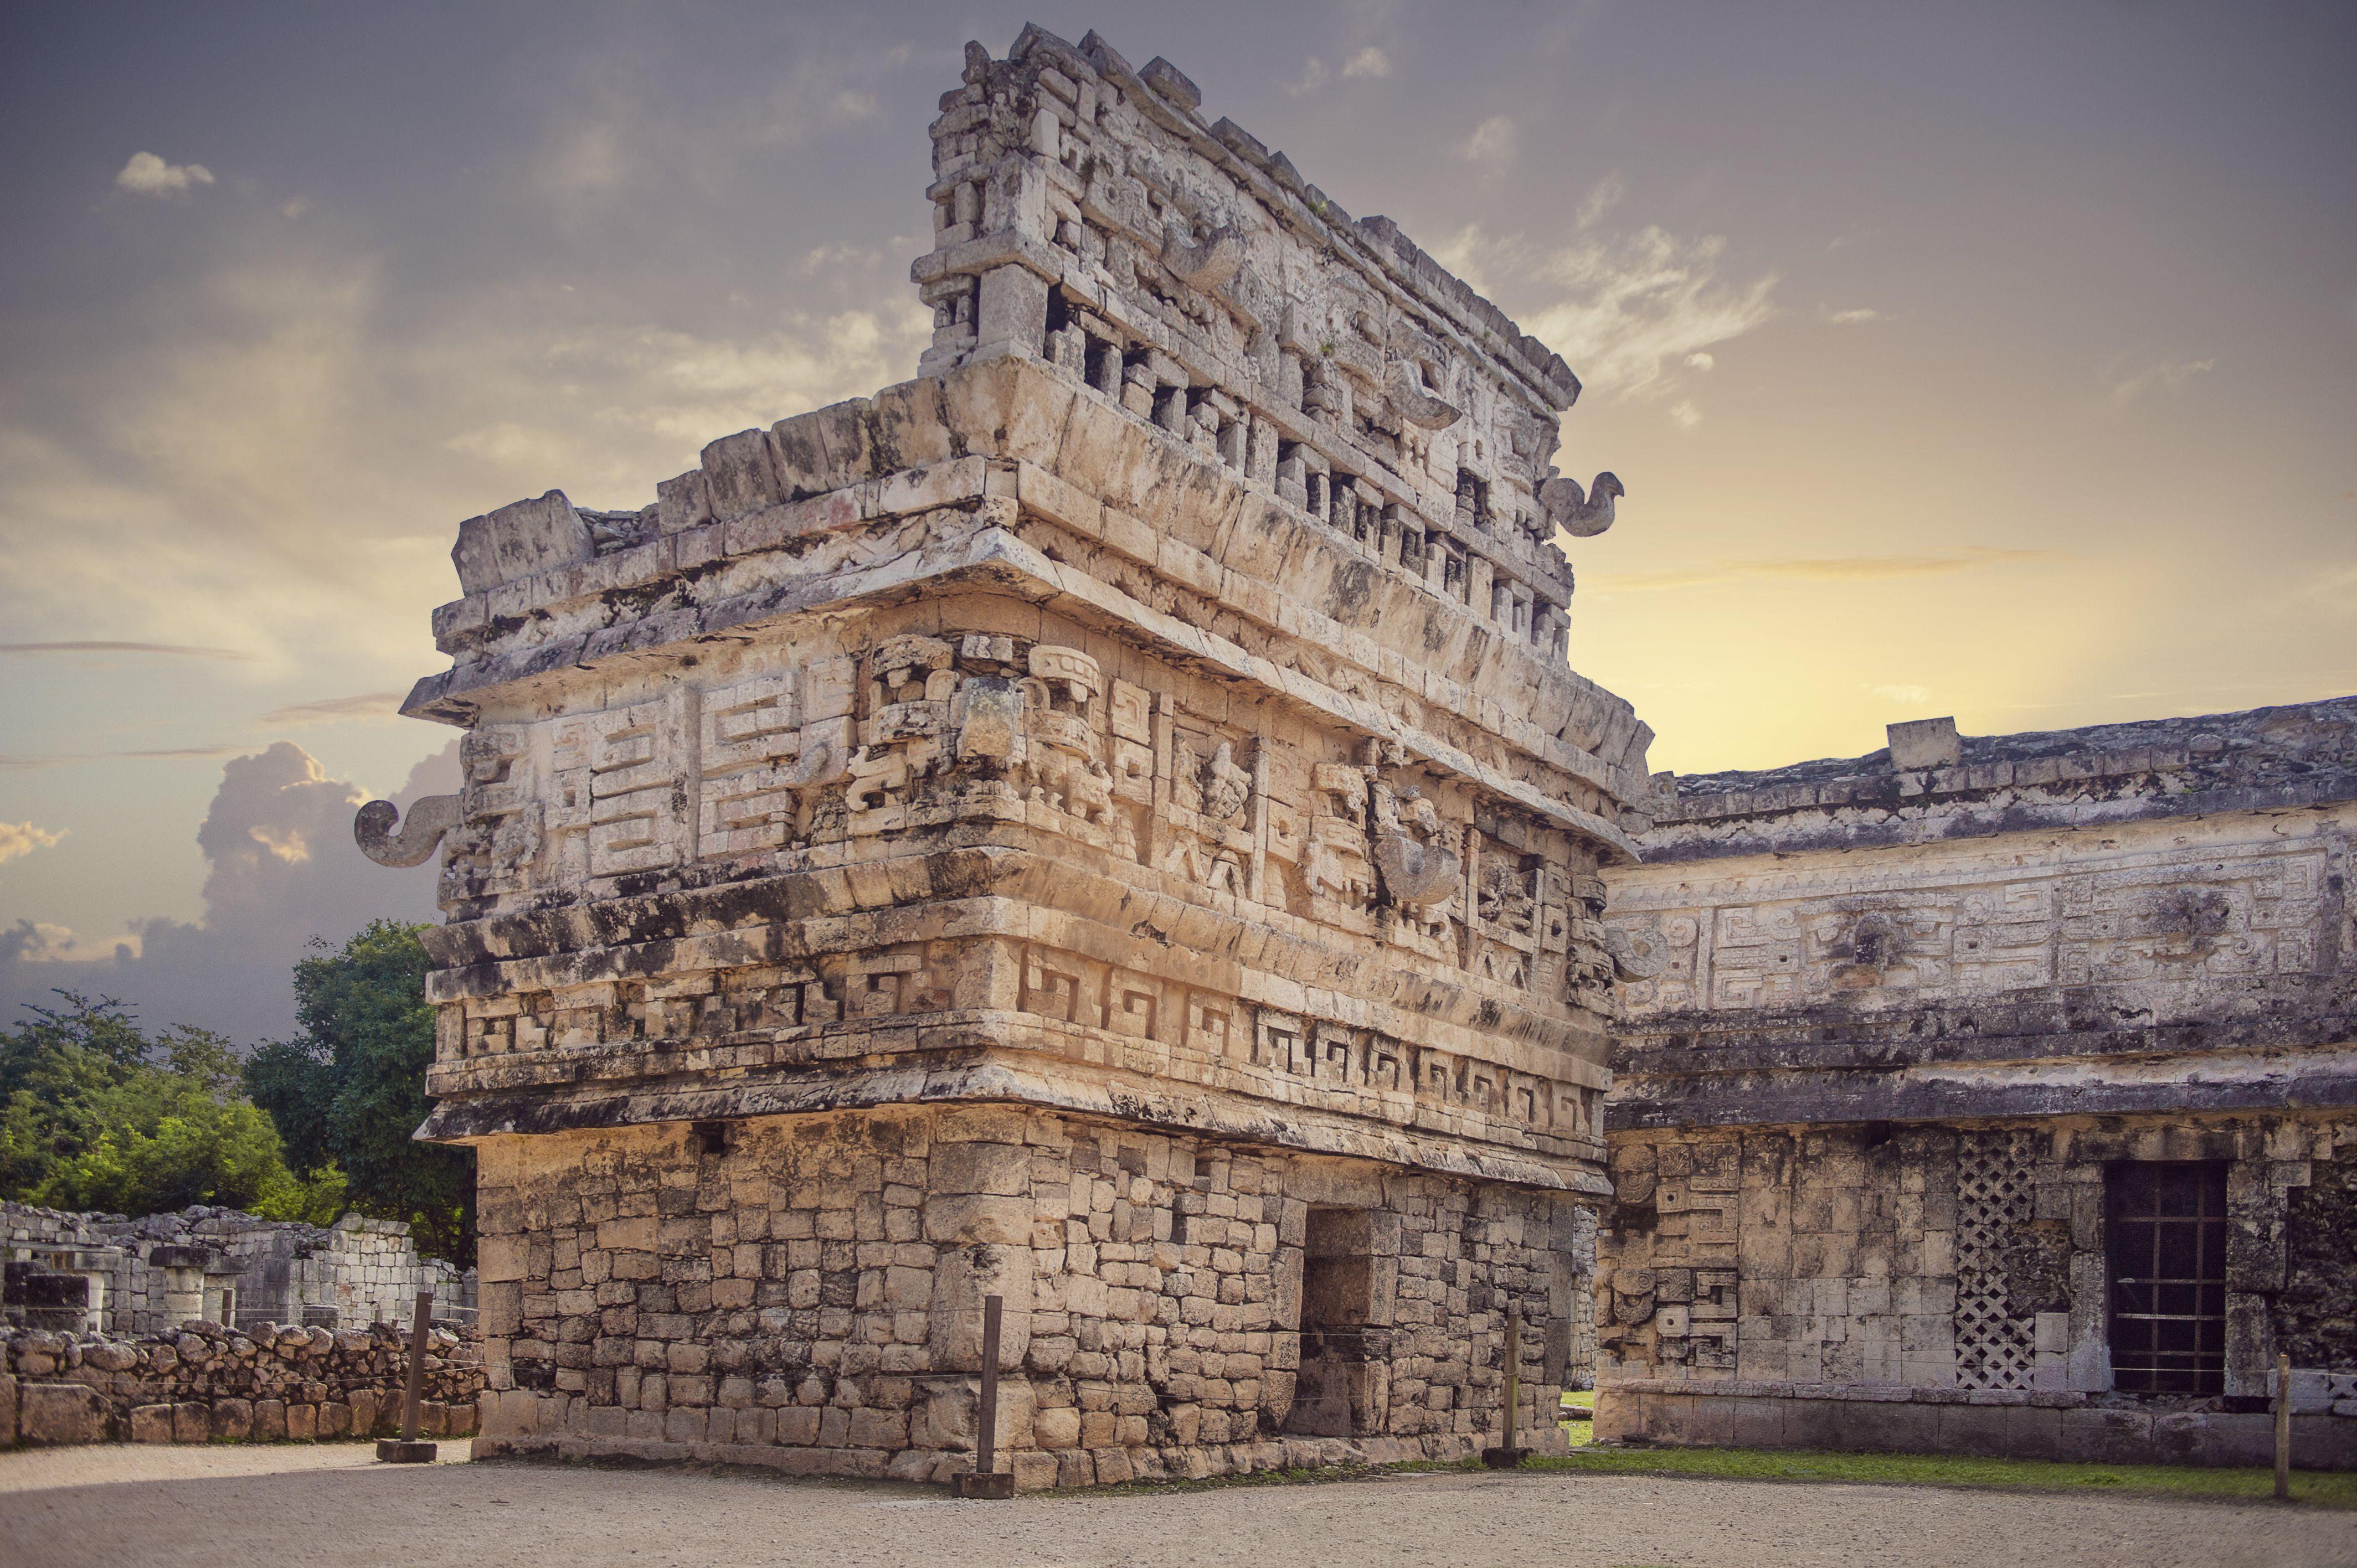 'La Iglesia' at Chichén Itzá /archeological site